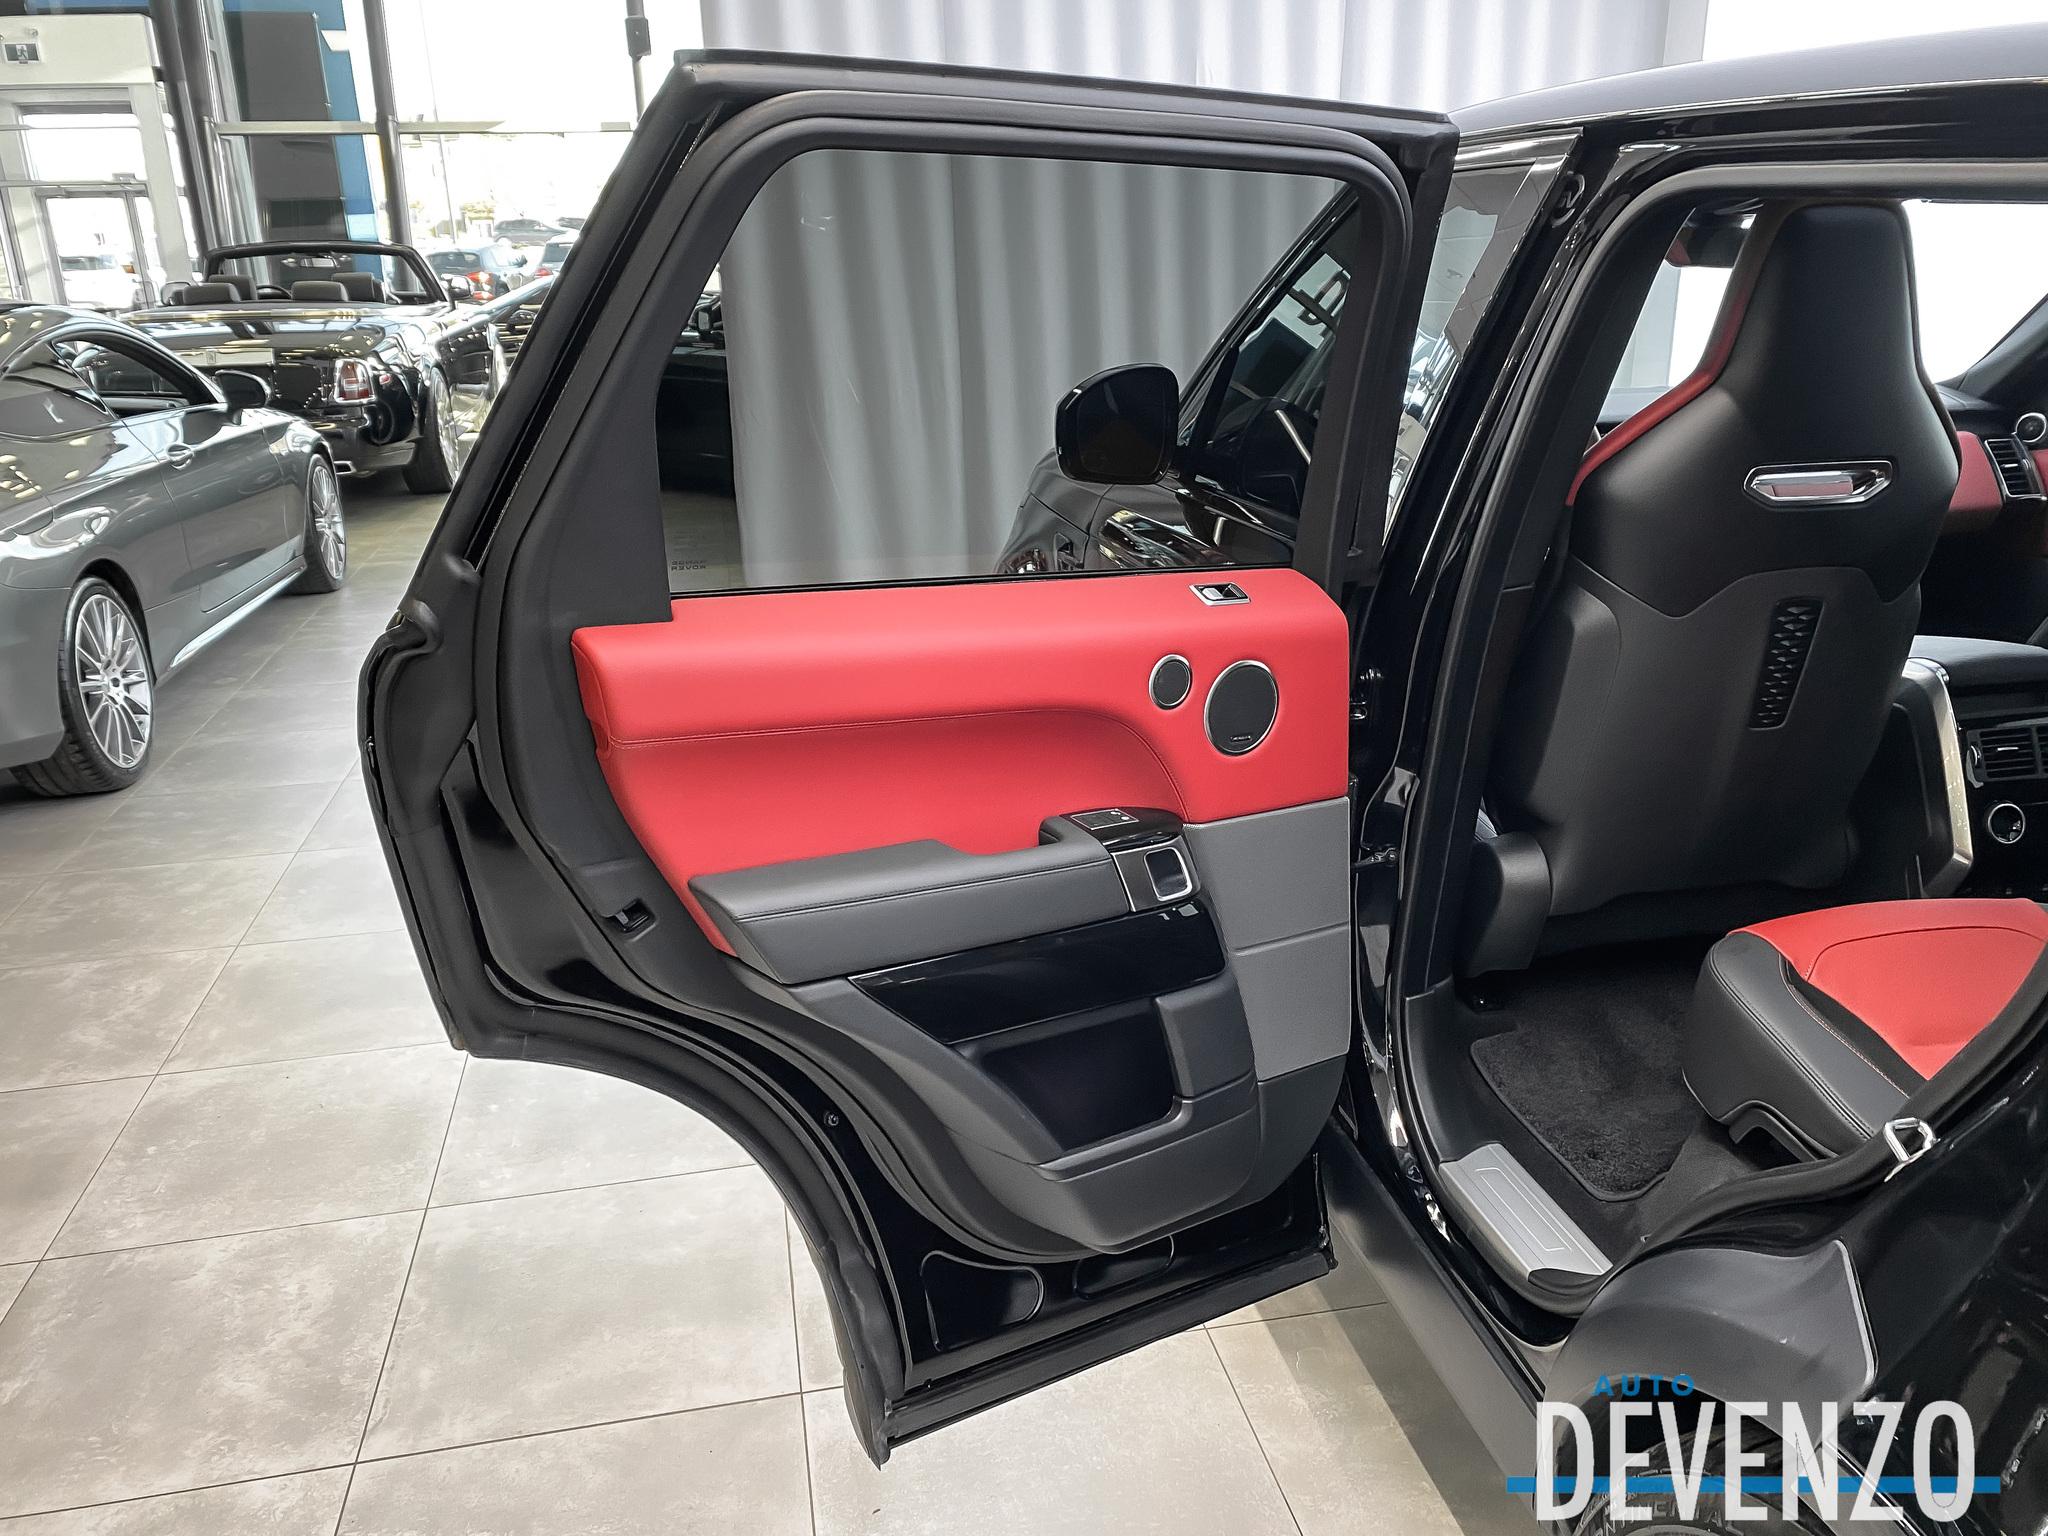 2020 Land Rover Range Rover Sport V8 Supercharged SVR 575HP Drive Pro Pack complet